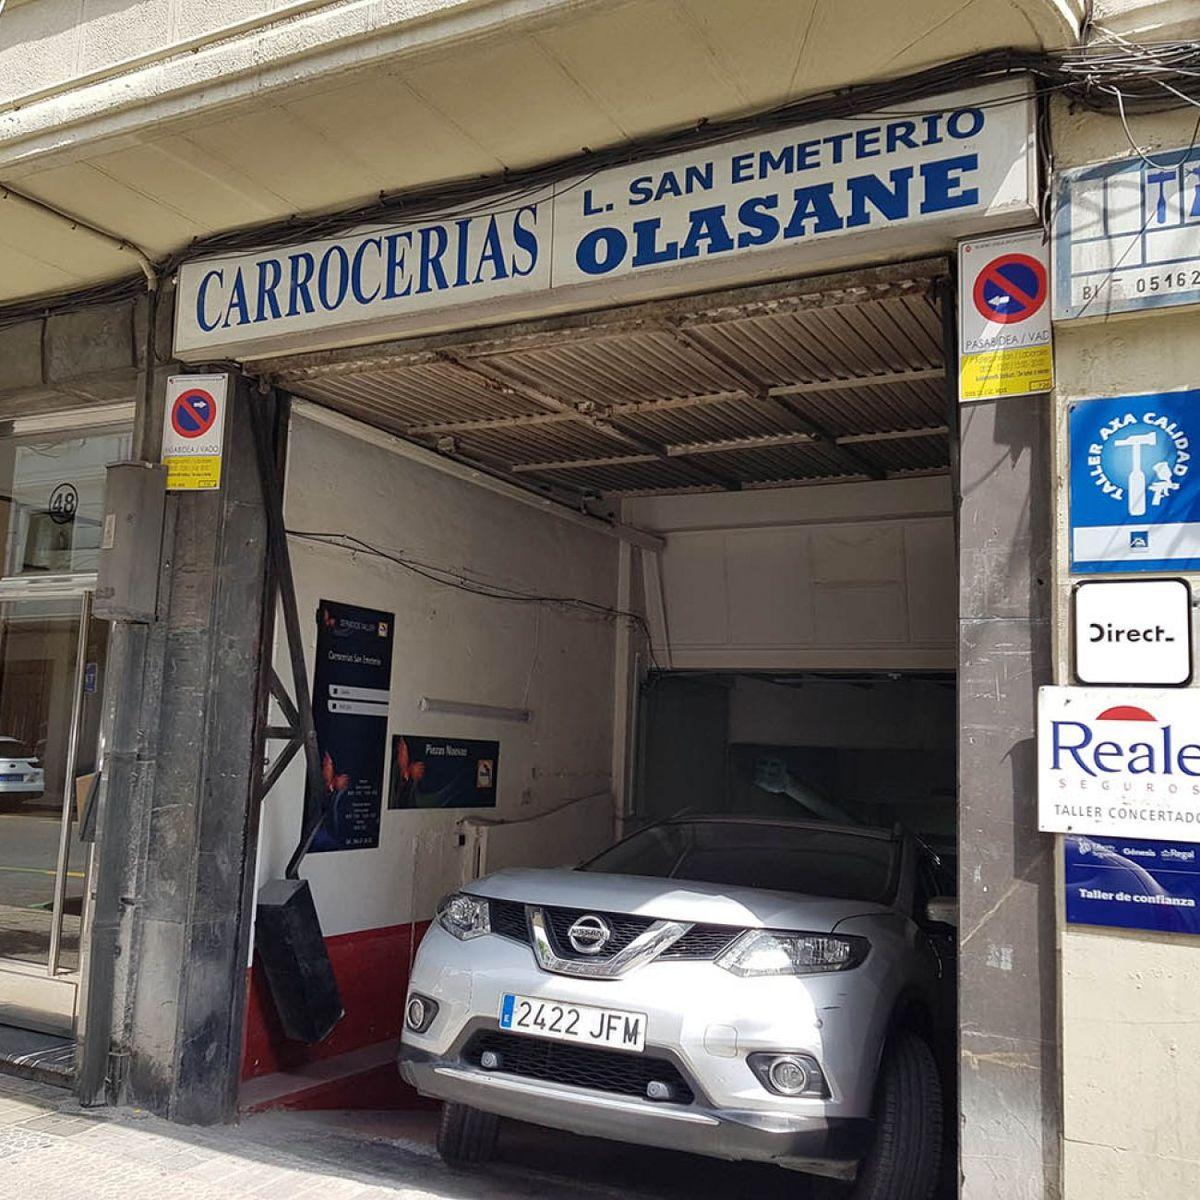 CARROCERIAS SAN EMETERIO EN BILBAO